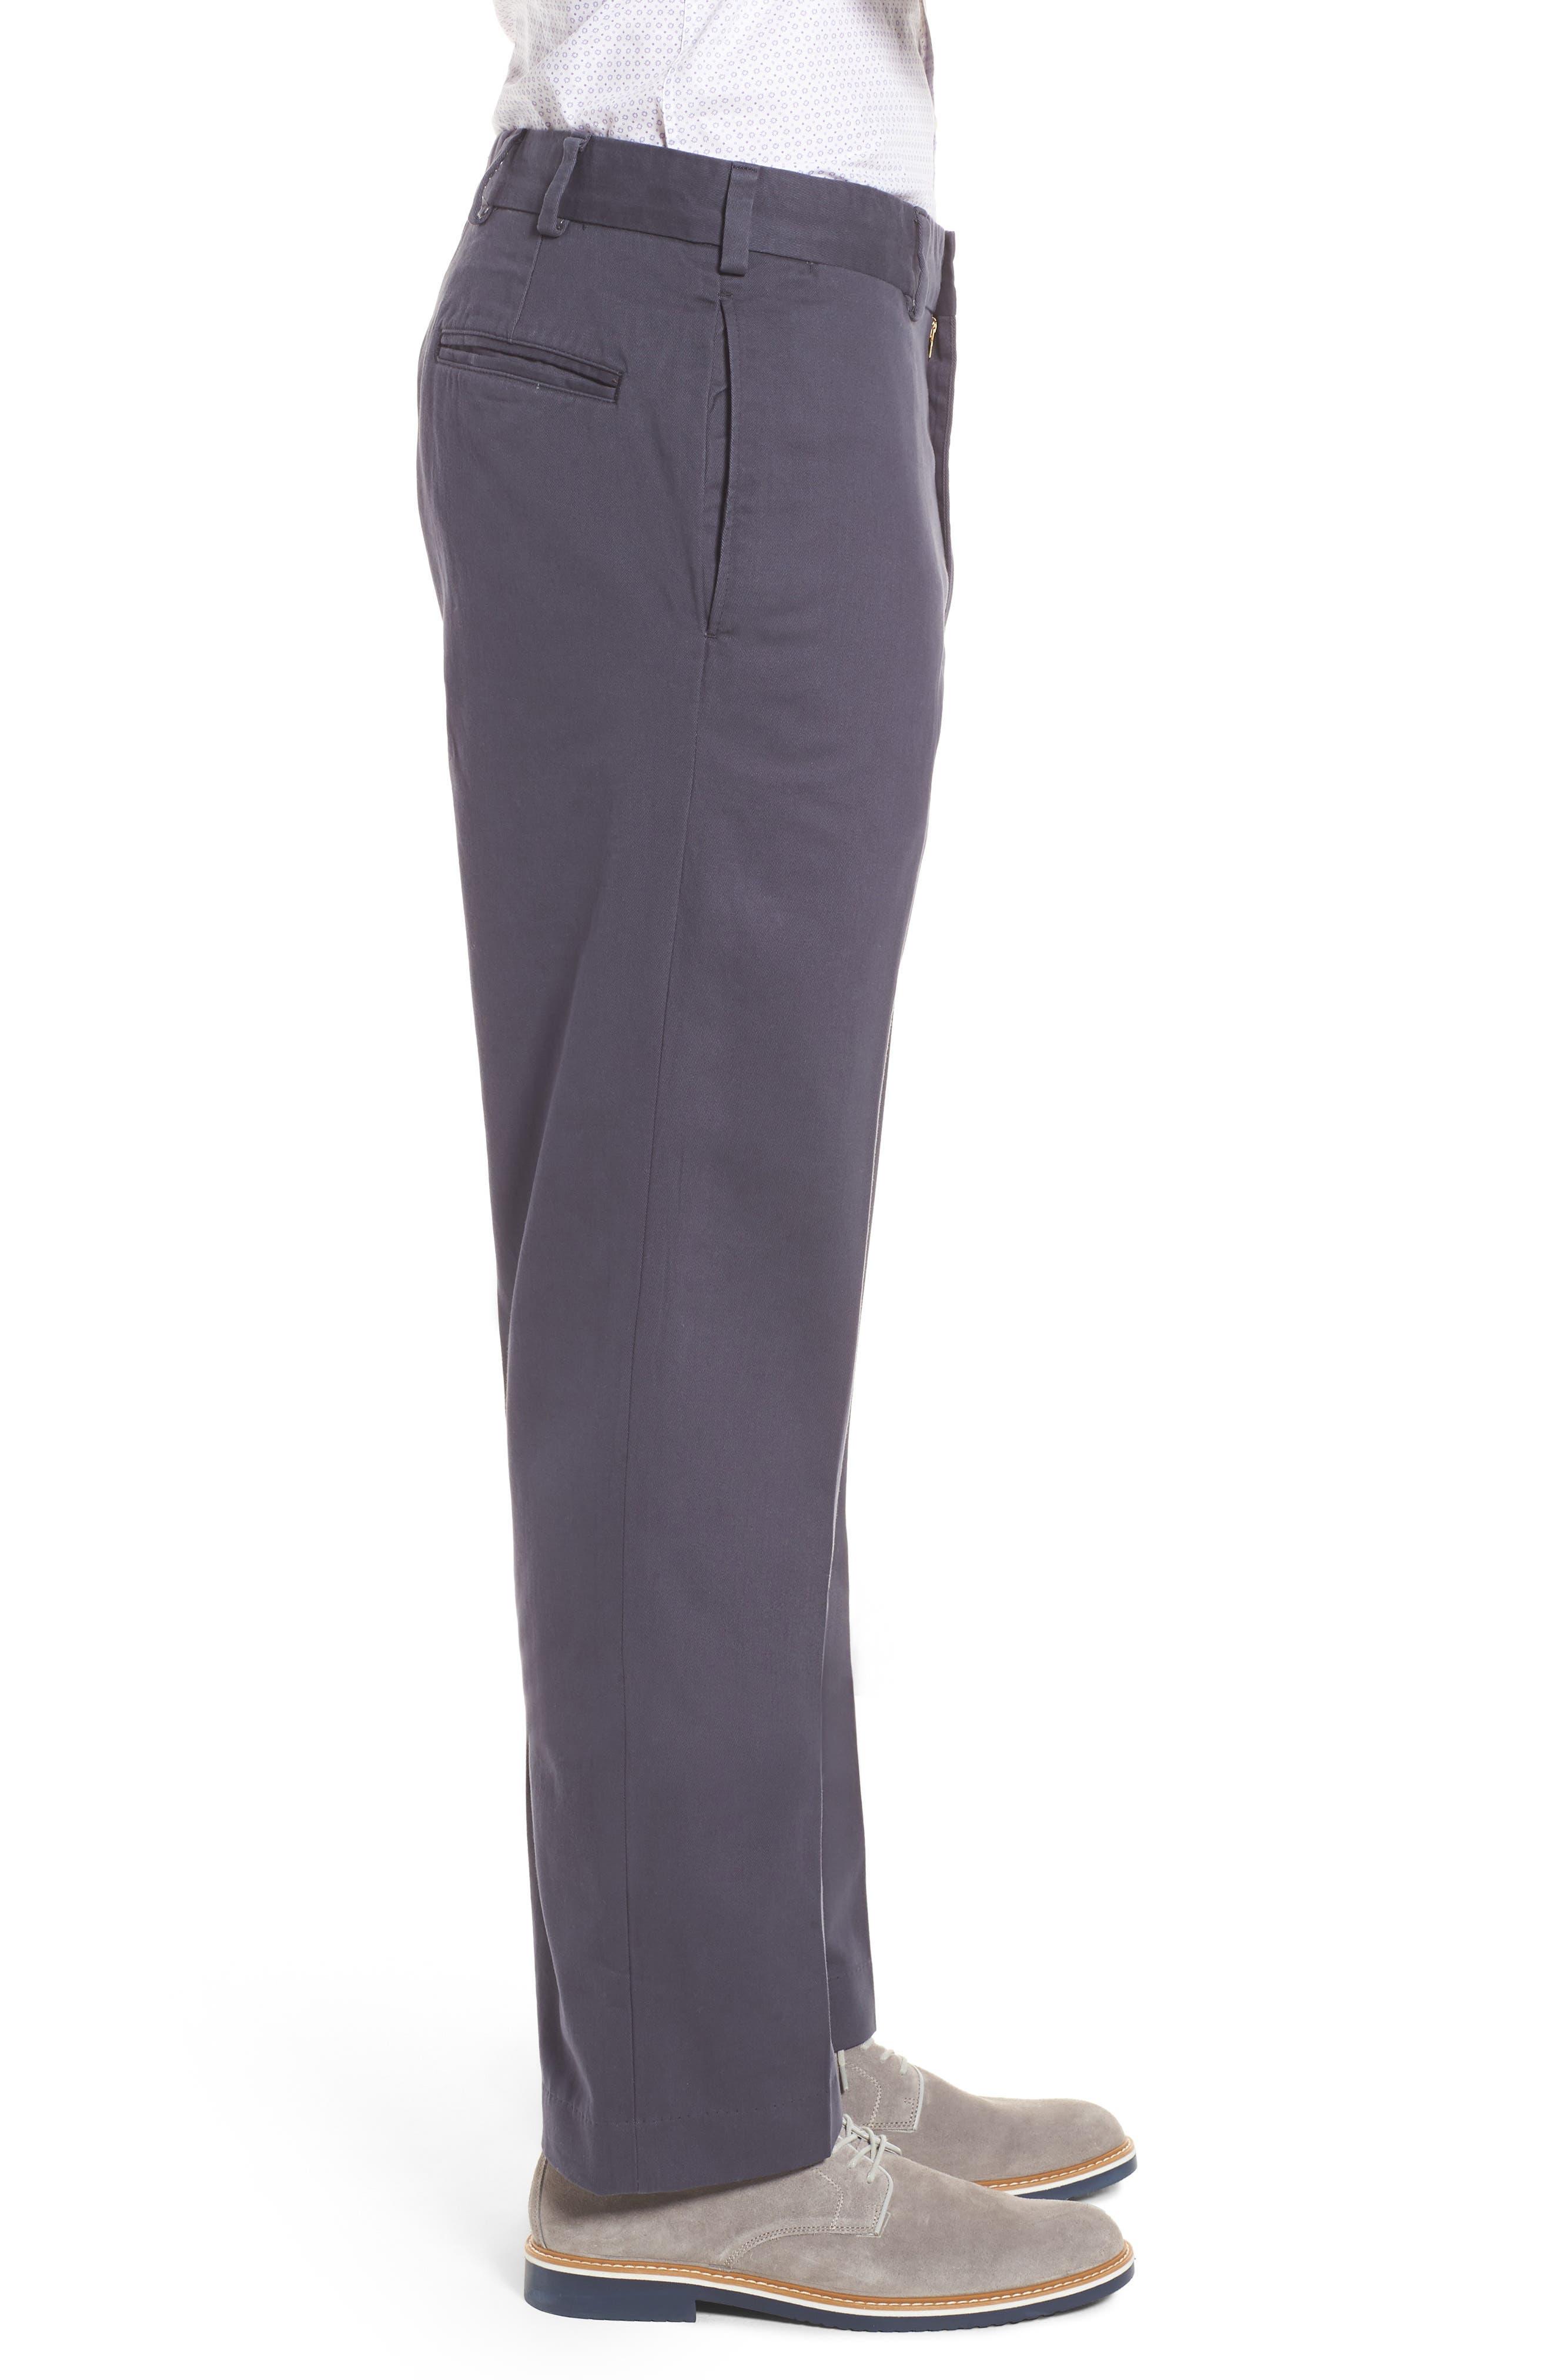 M2 Classic Fit Flat Front Vintage Twill Pants,                             Alternate thumbnail 3, color,                             410